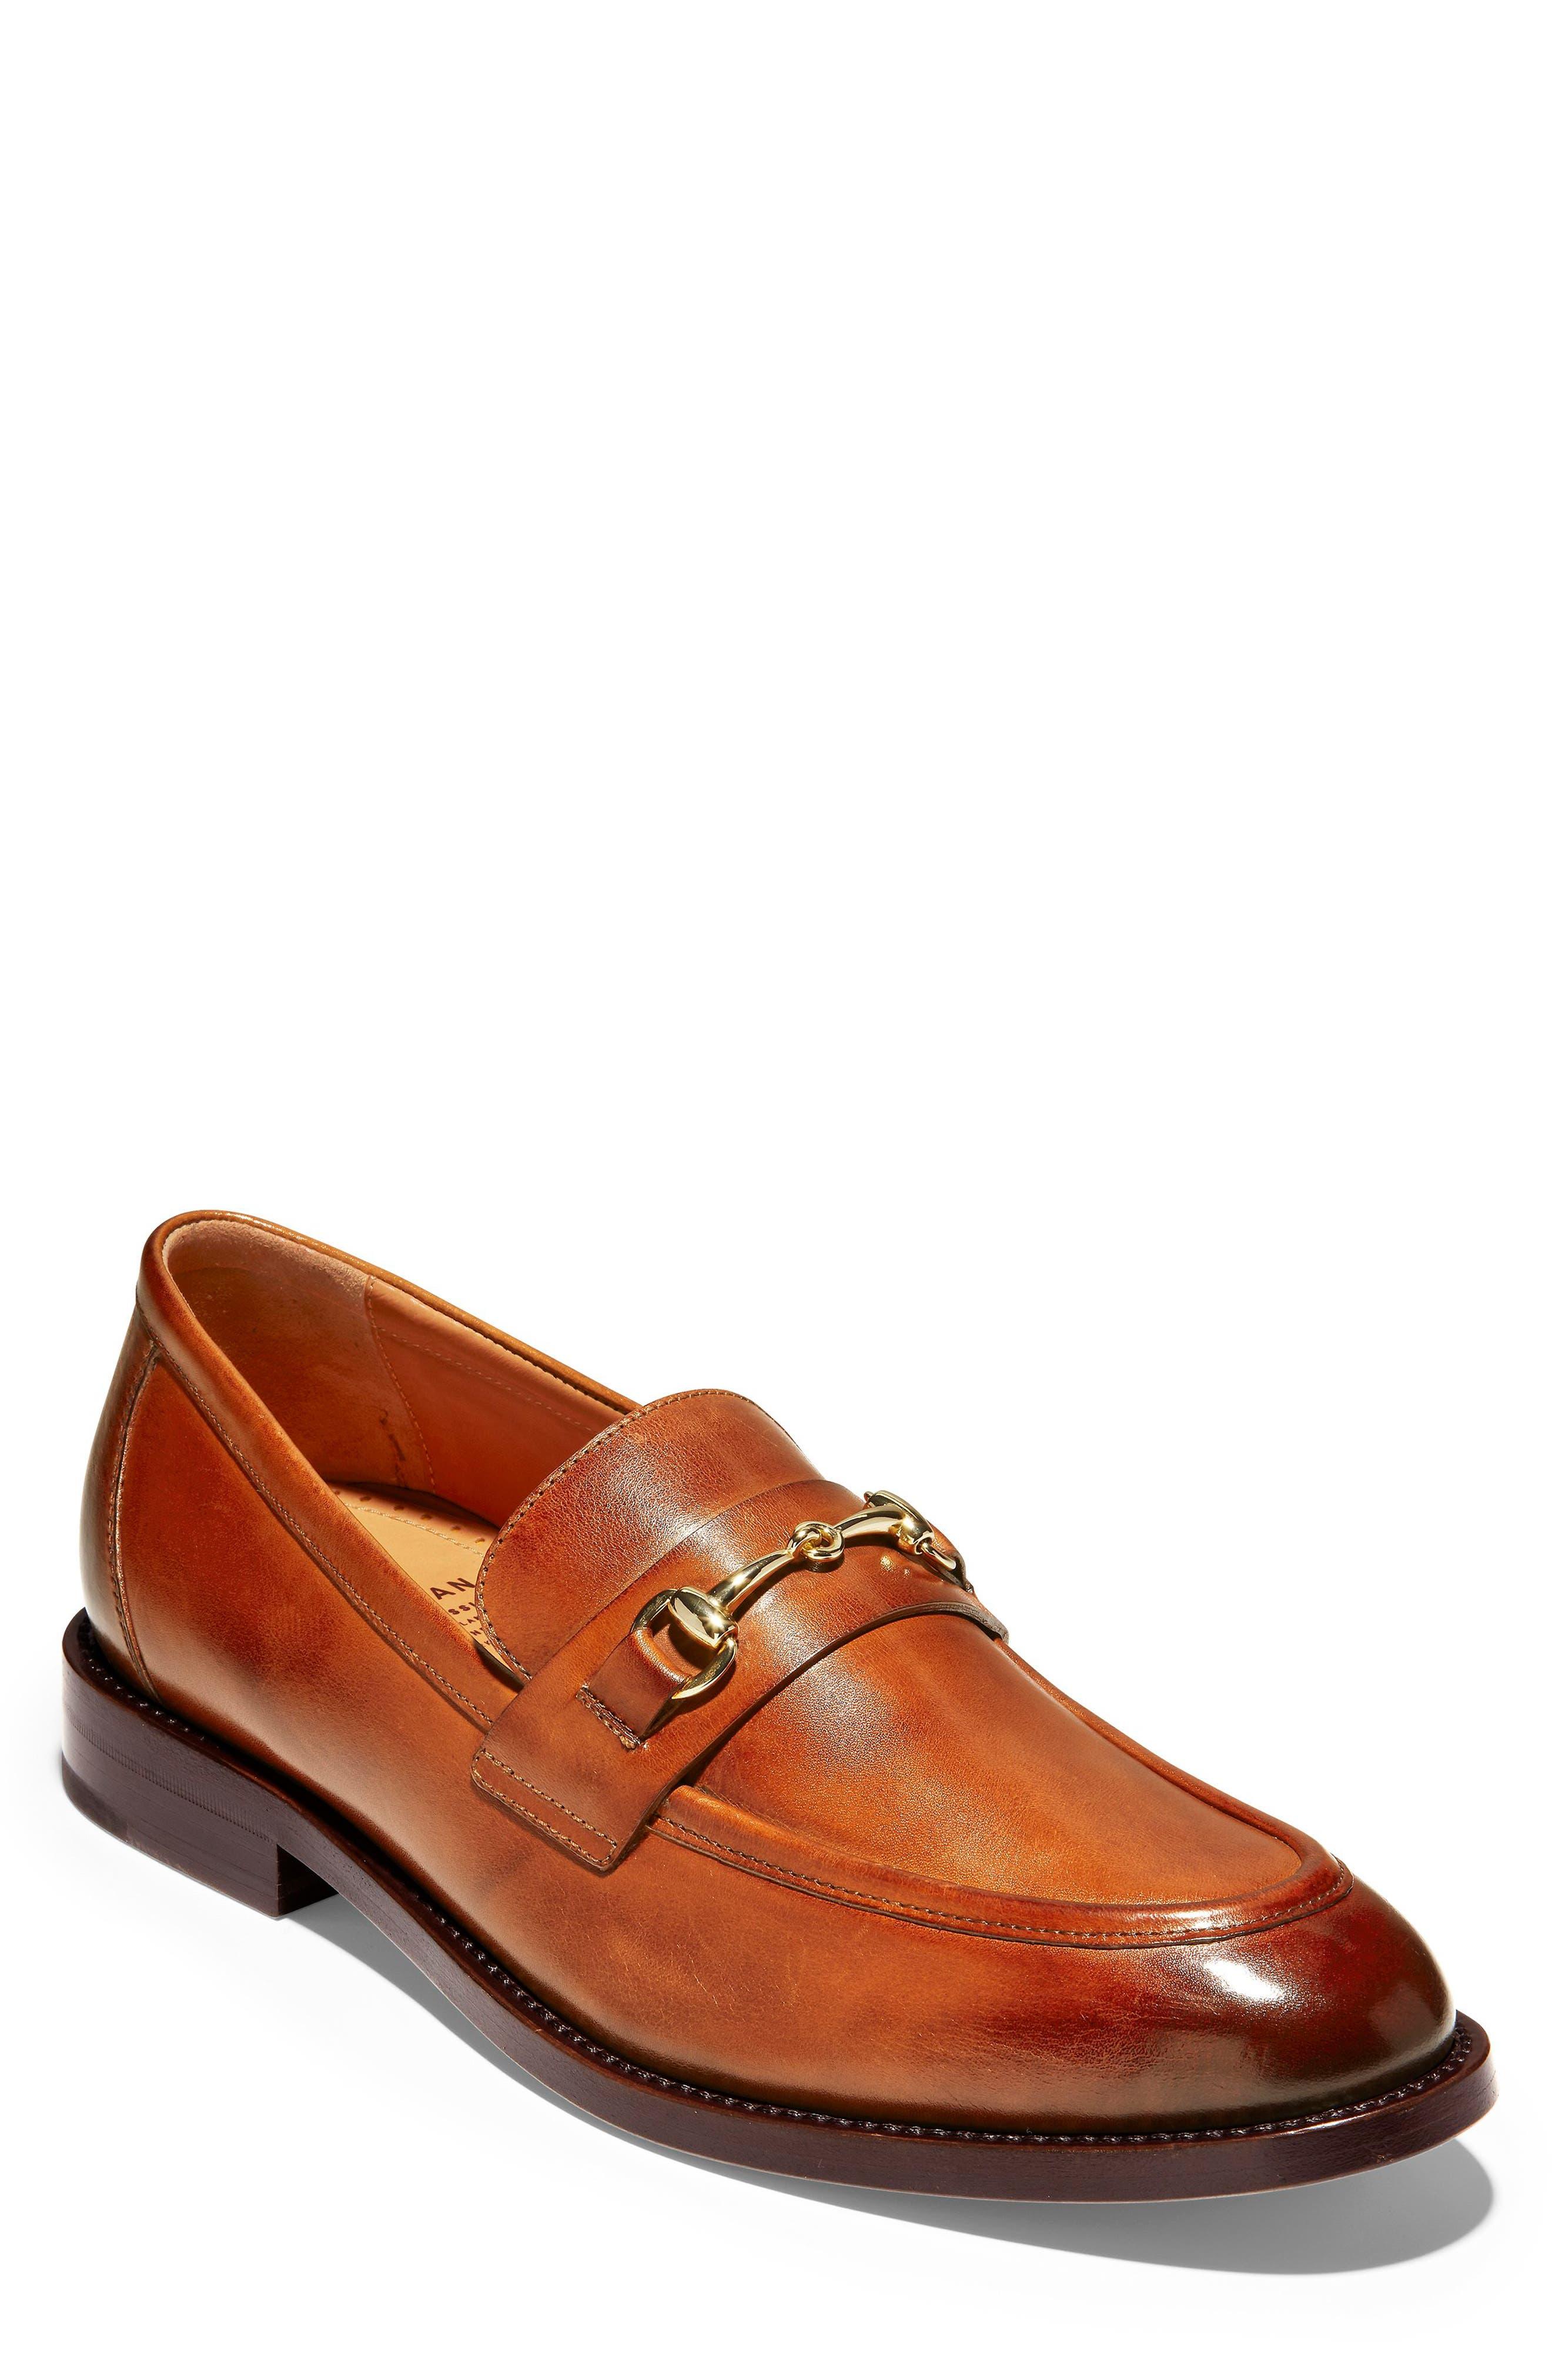 American Classics Kneeland Bit Loafer,                         Main,                         color, BRITISH TAN LEATHER